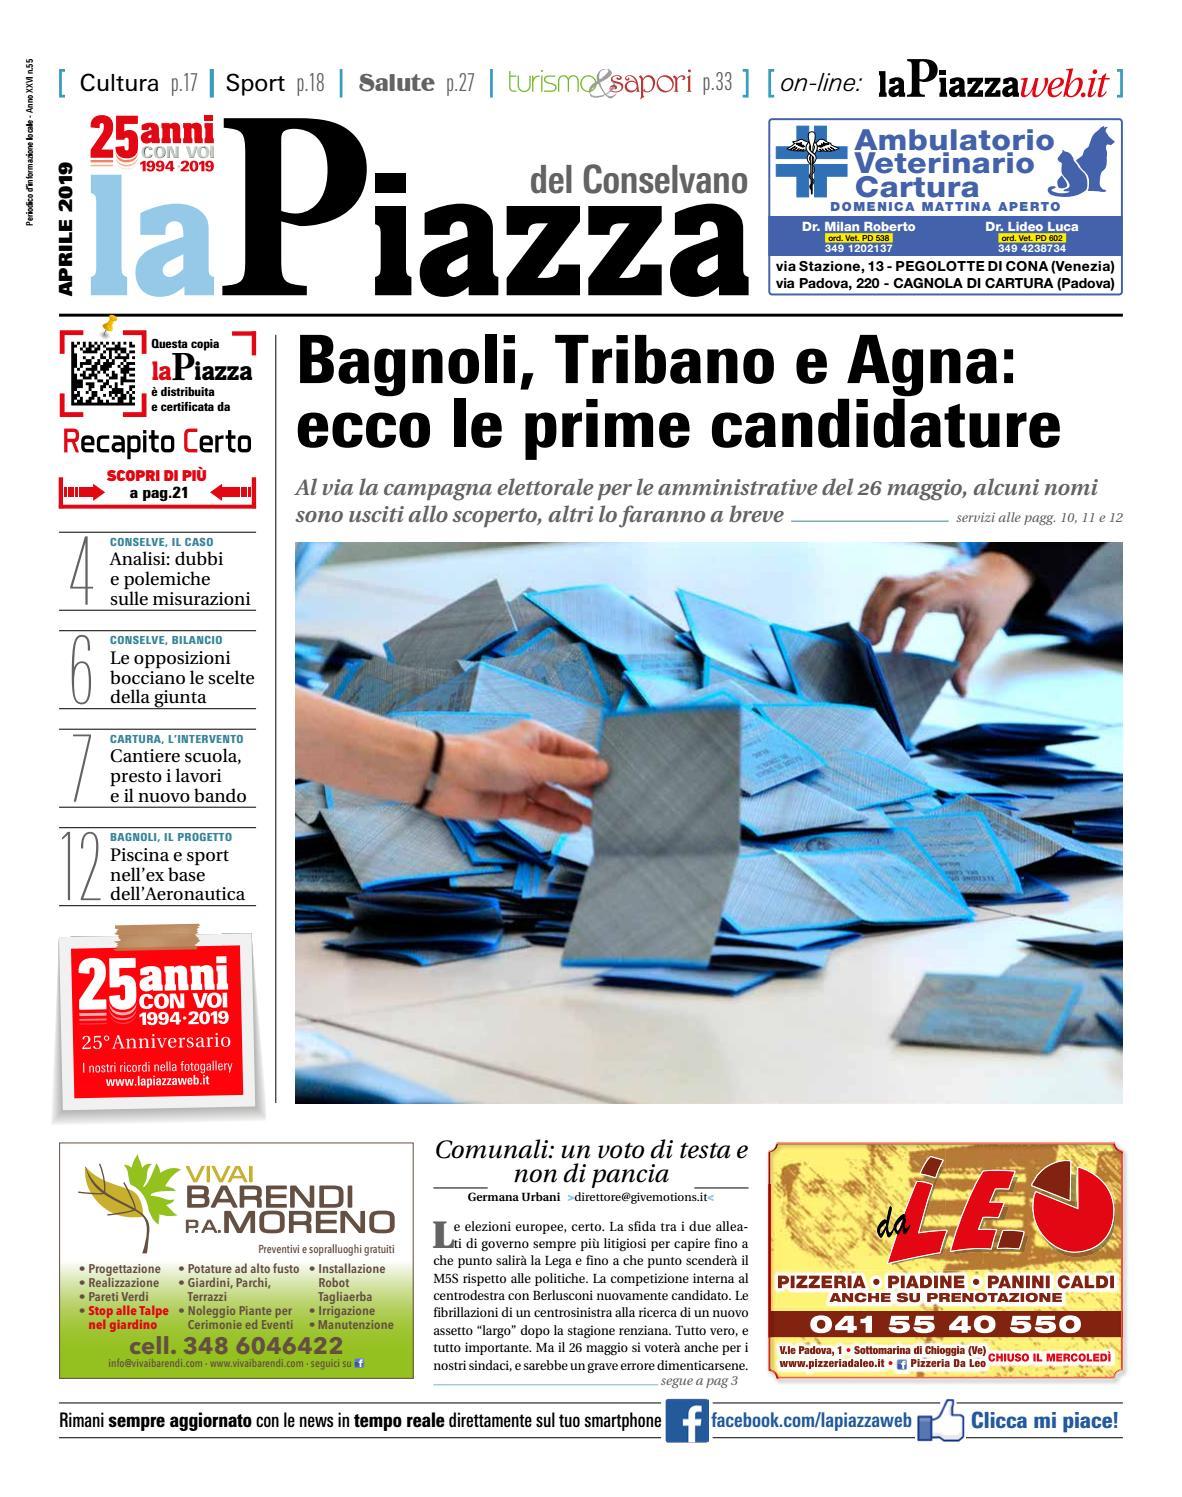 37b53f358108 La Piazza del conselvano apr2019 n55 by lapiazza give emotions - issuu